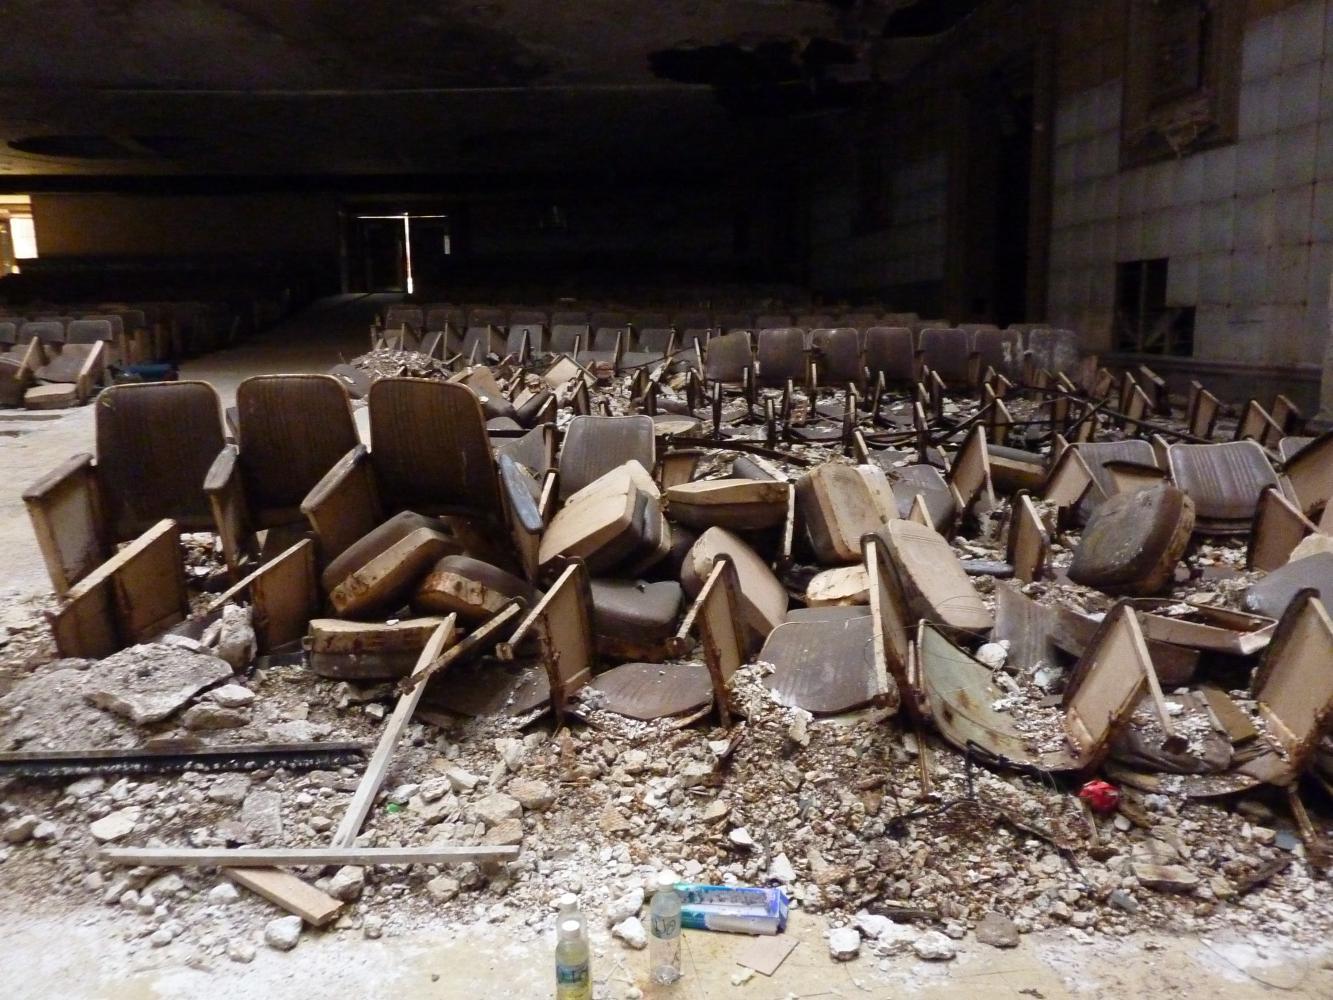 Seats (c) Michael Nyman